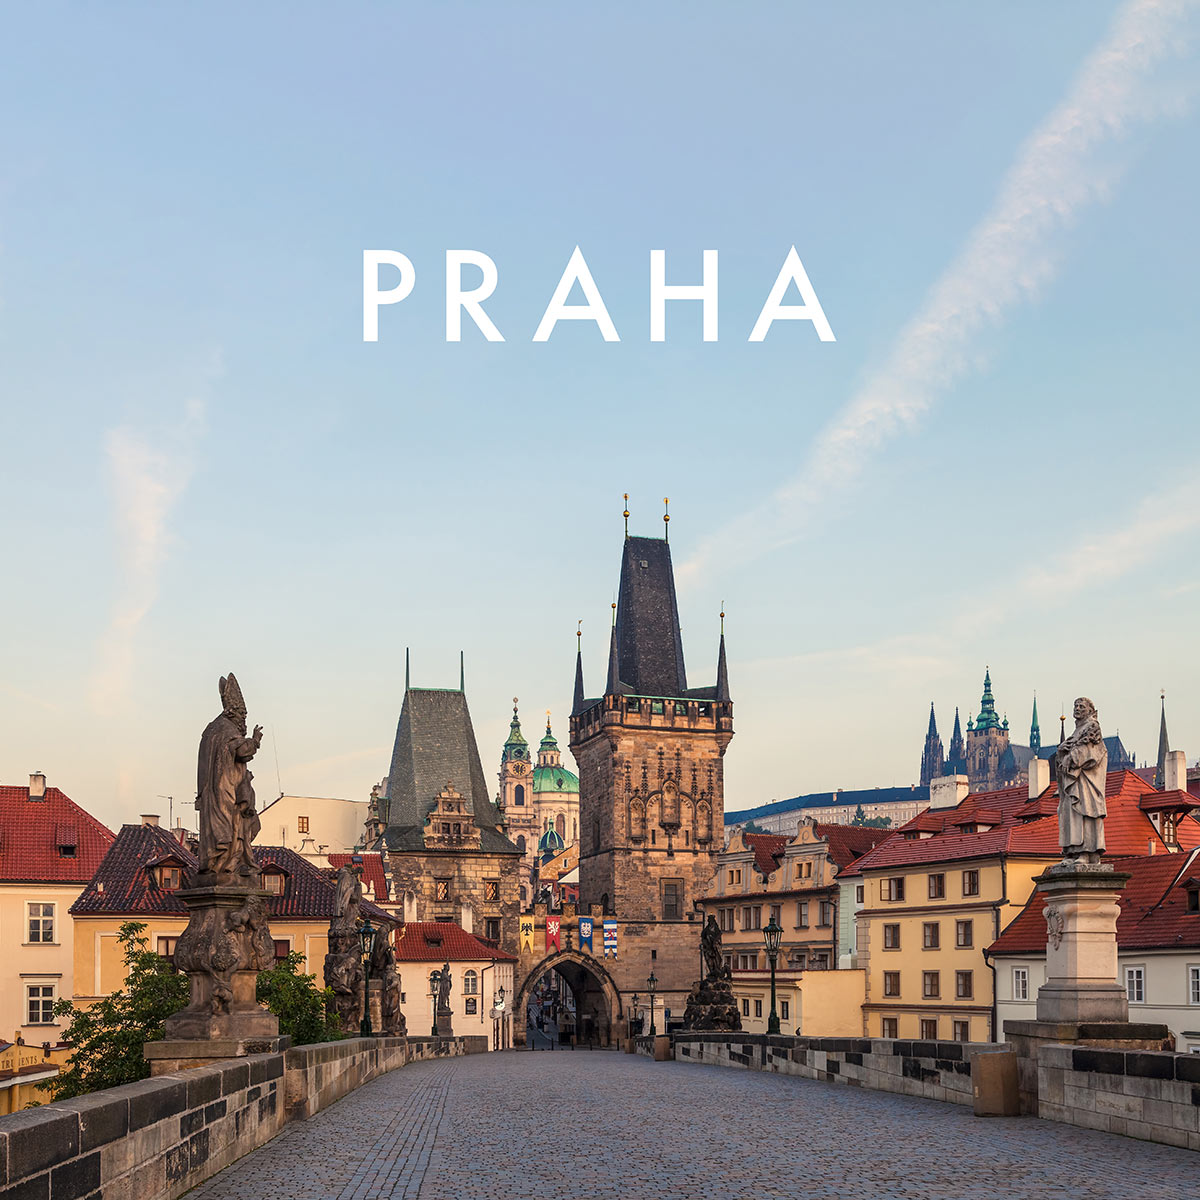 The Lesser Town Bridge Tower (Malostranská mostecká věž), Prague Castle (Pražský hrad) and the Charles Bridge (Karlův most) at Sunrise, Prague, Czechia